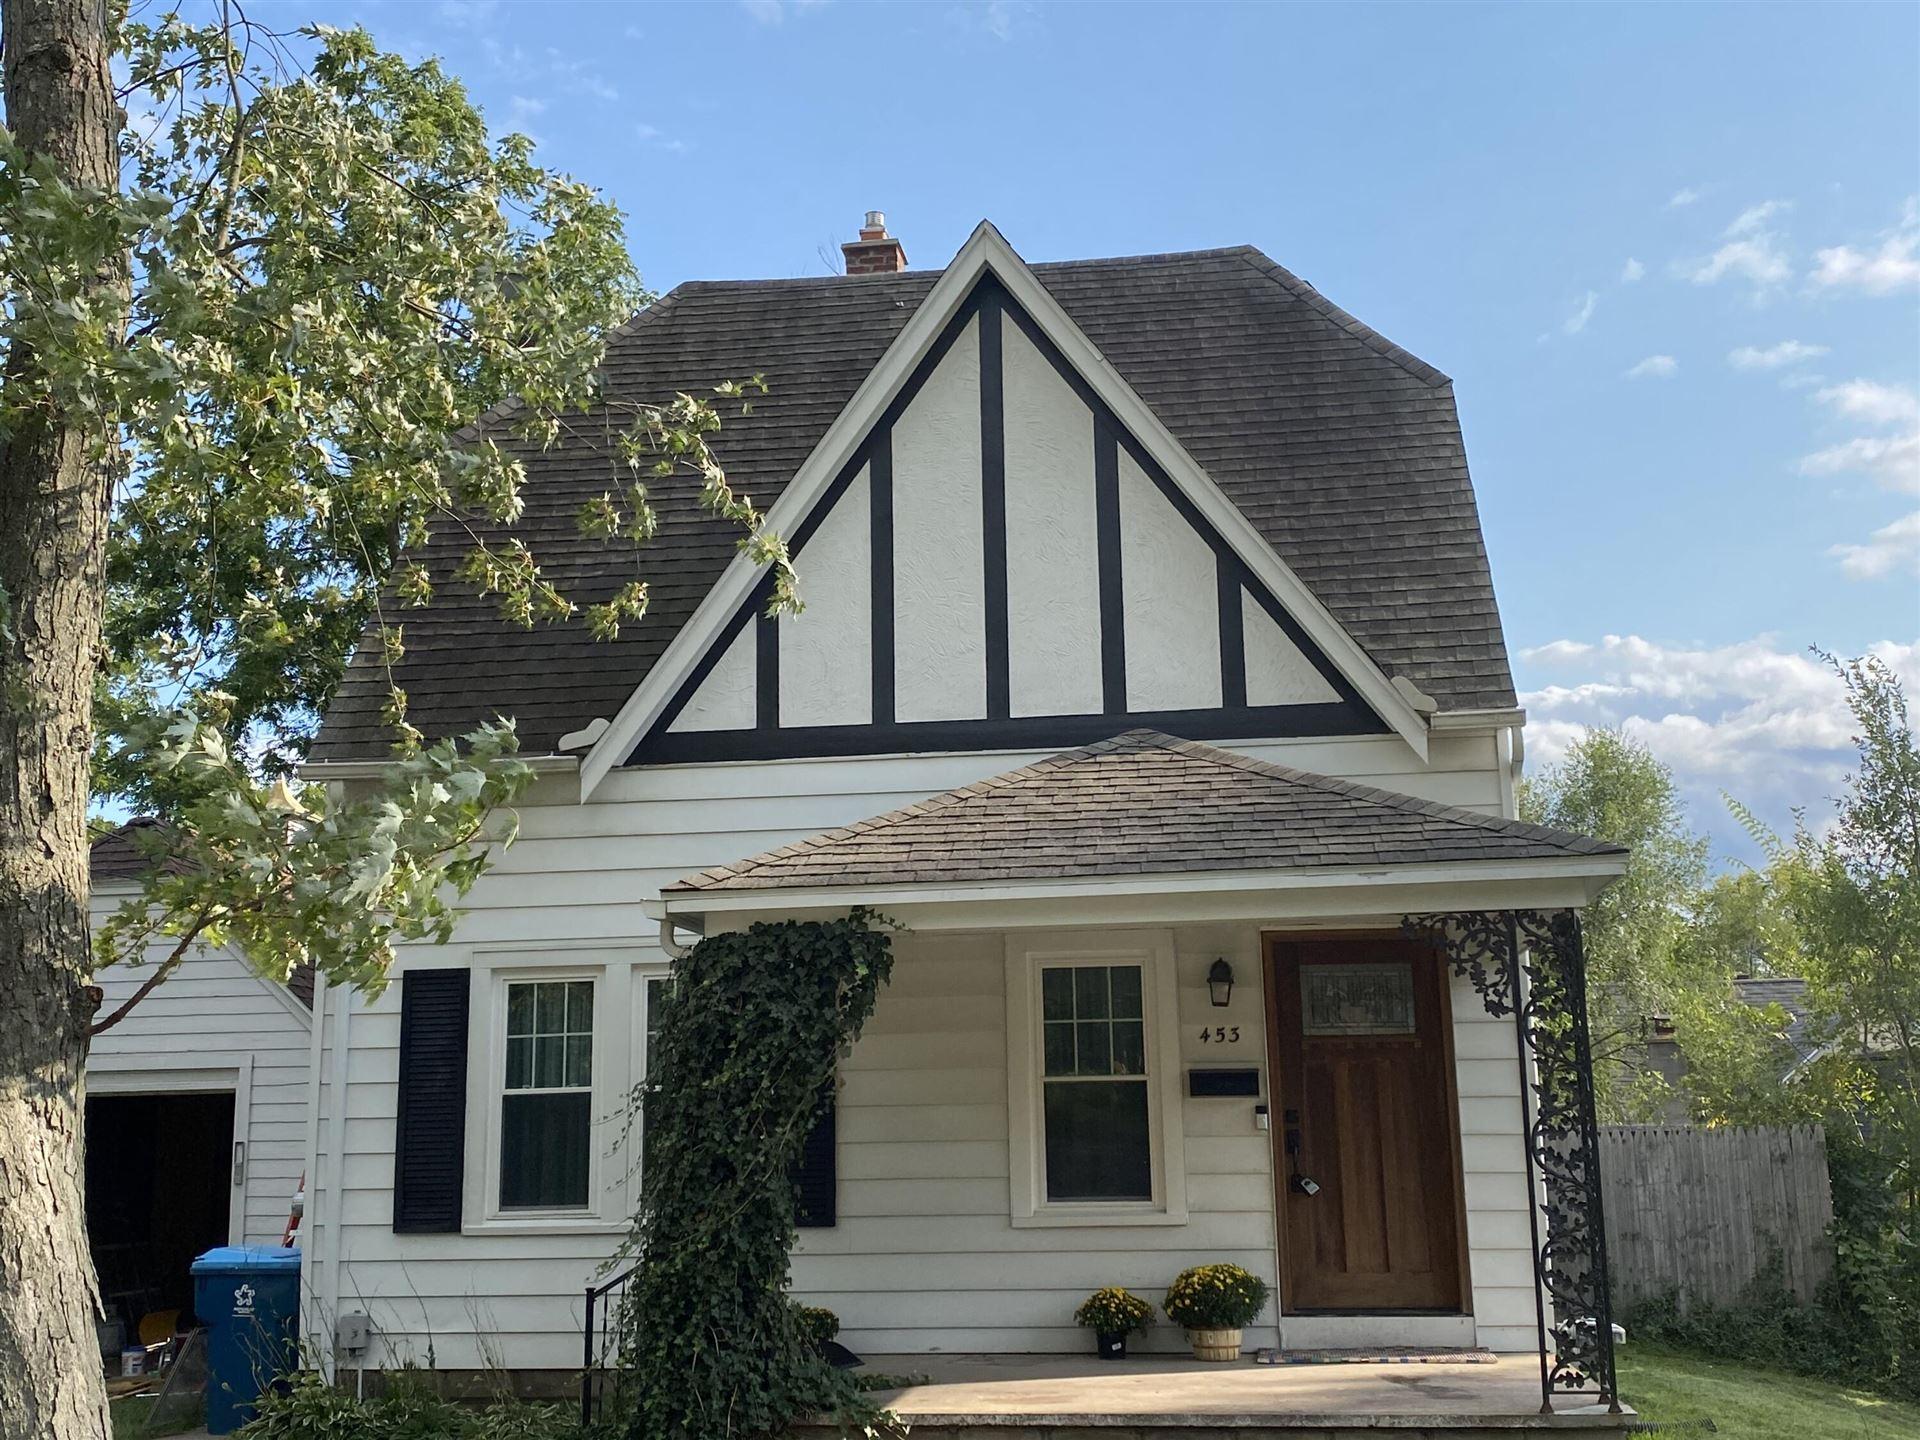 453 Fairview Avenue, Kalamazoo, MI 49001 - MLS#: 21105053